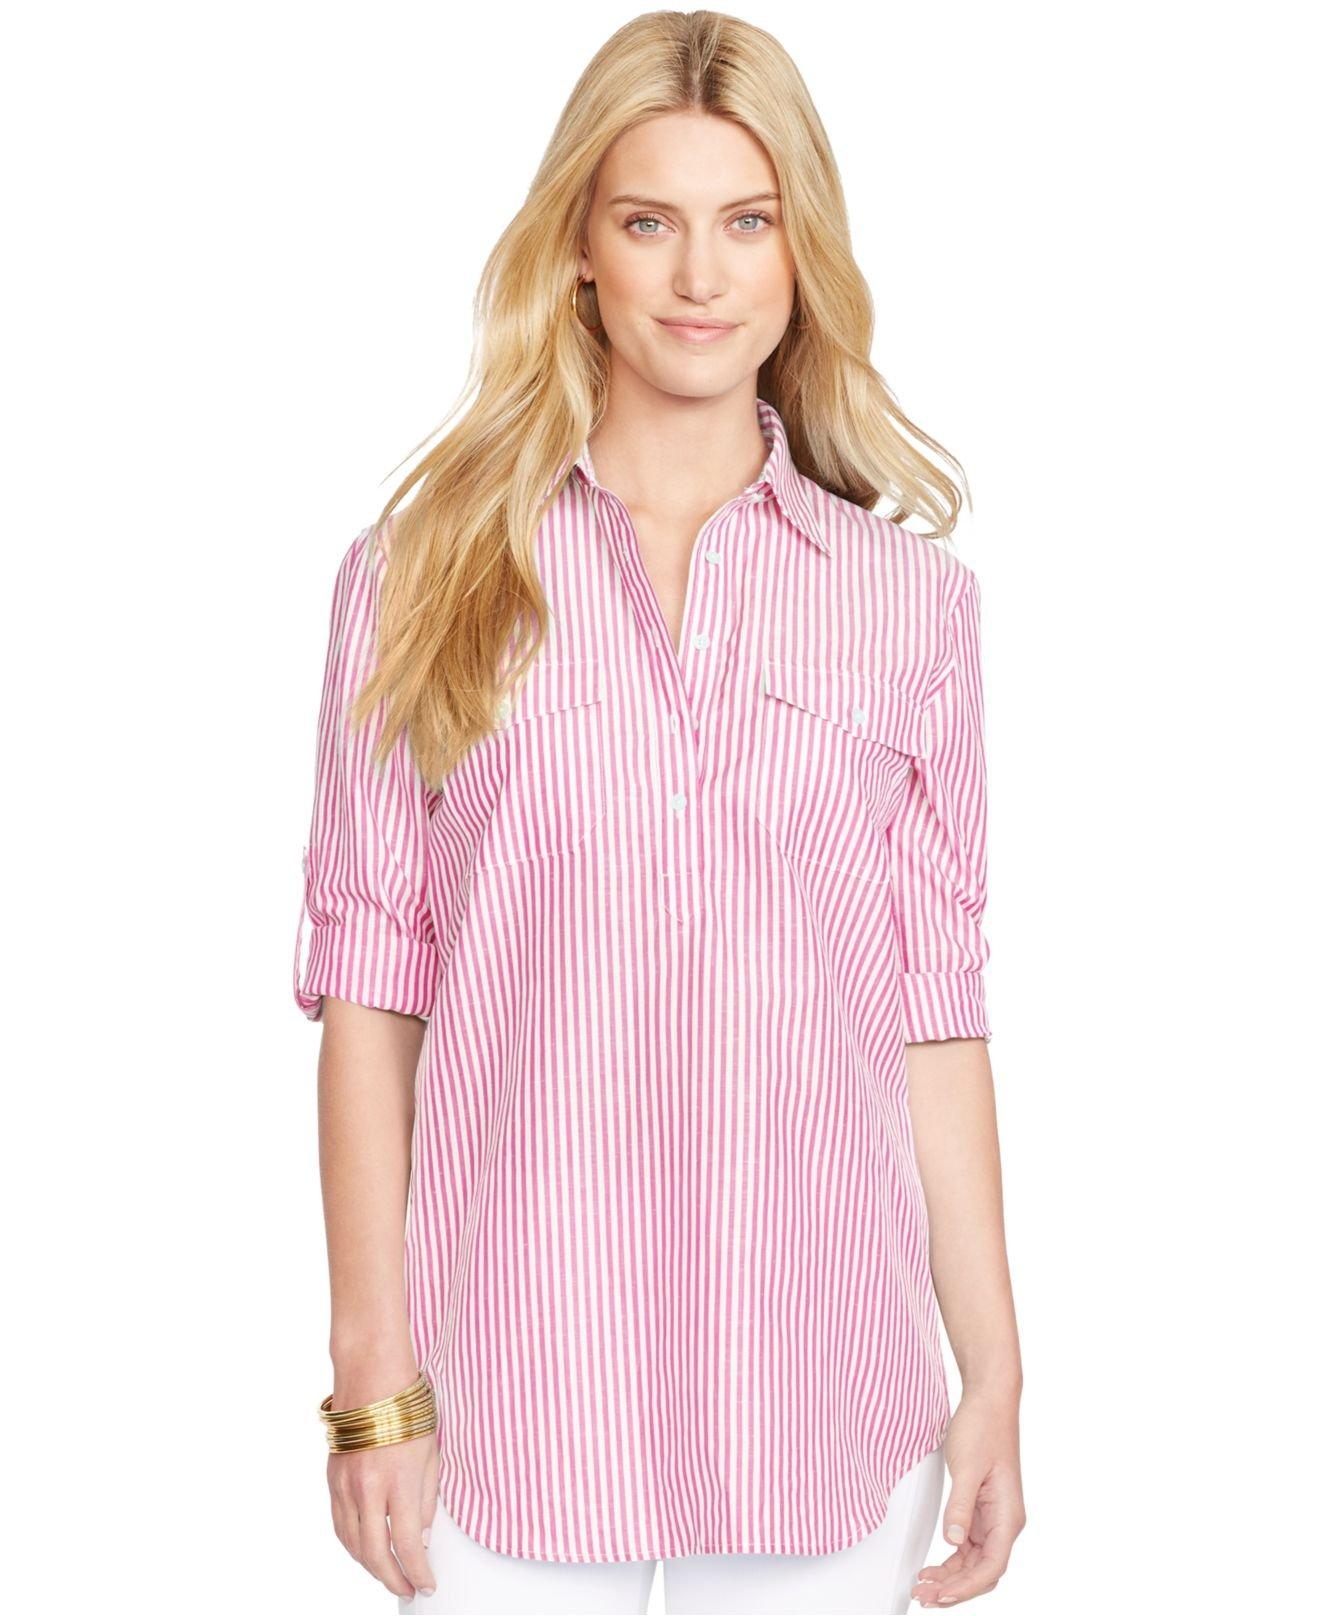 Lauren by ralph lauren linen bengal stripe shirt in pink for Pink white striped shirt